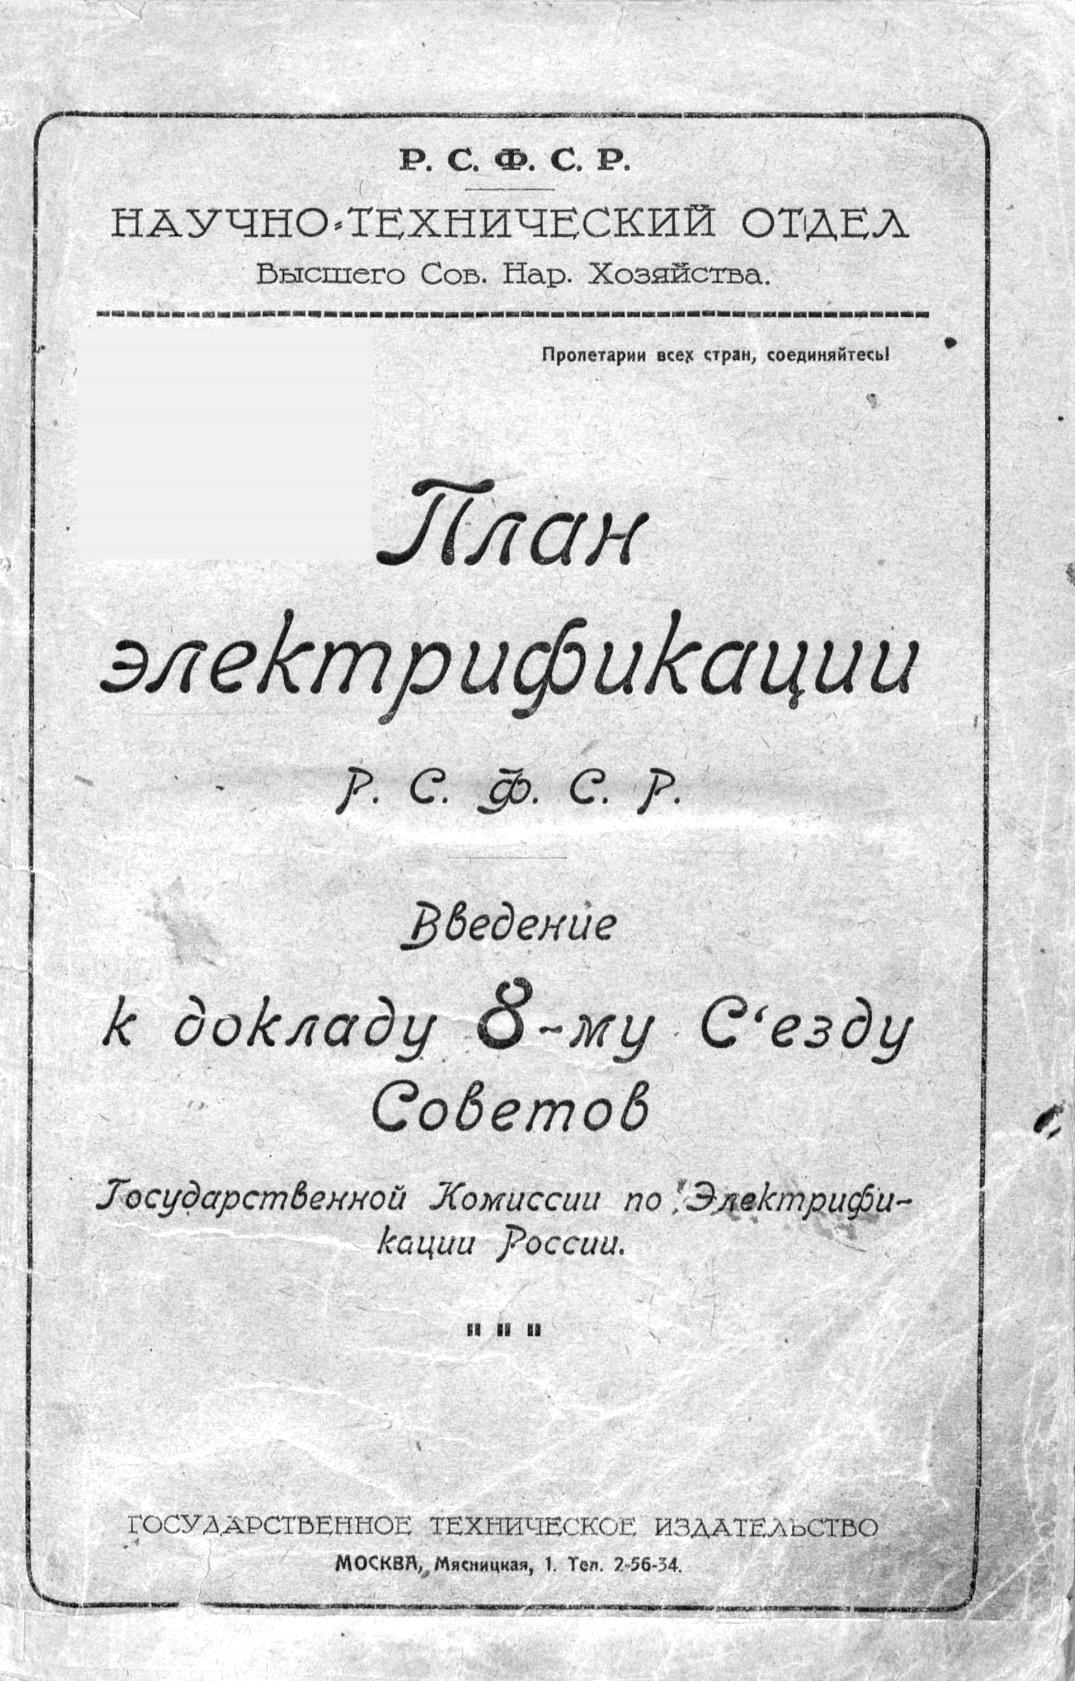 GOELRO plan title page 1920.jpg